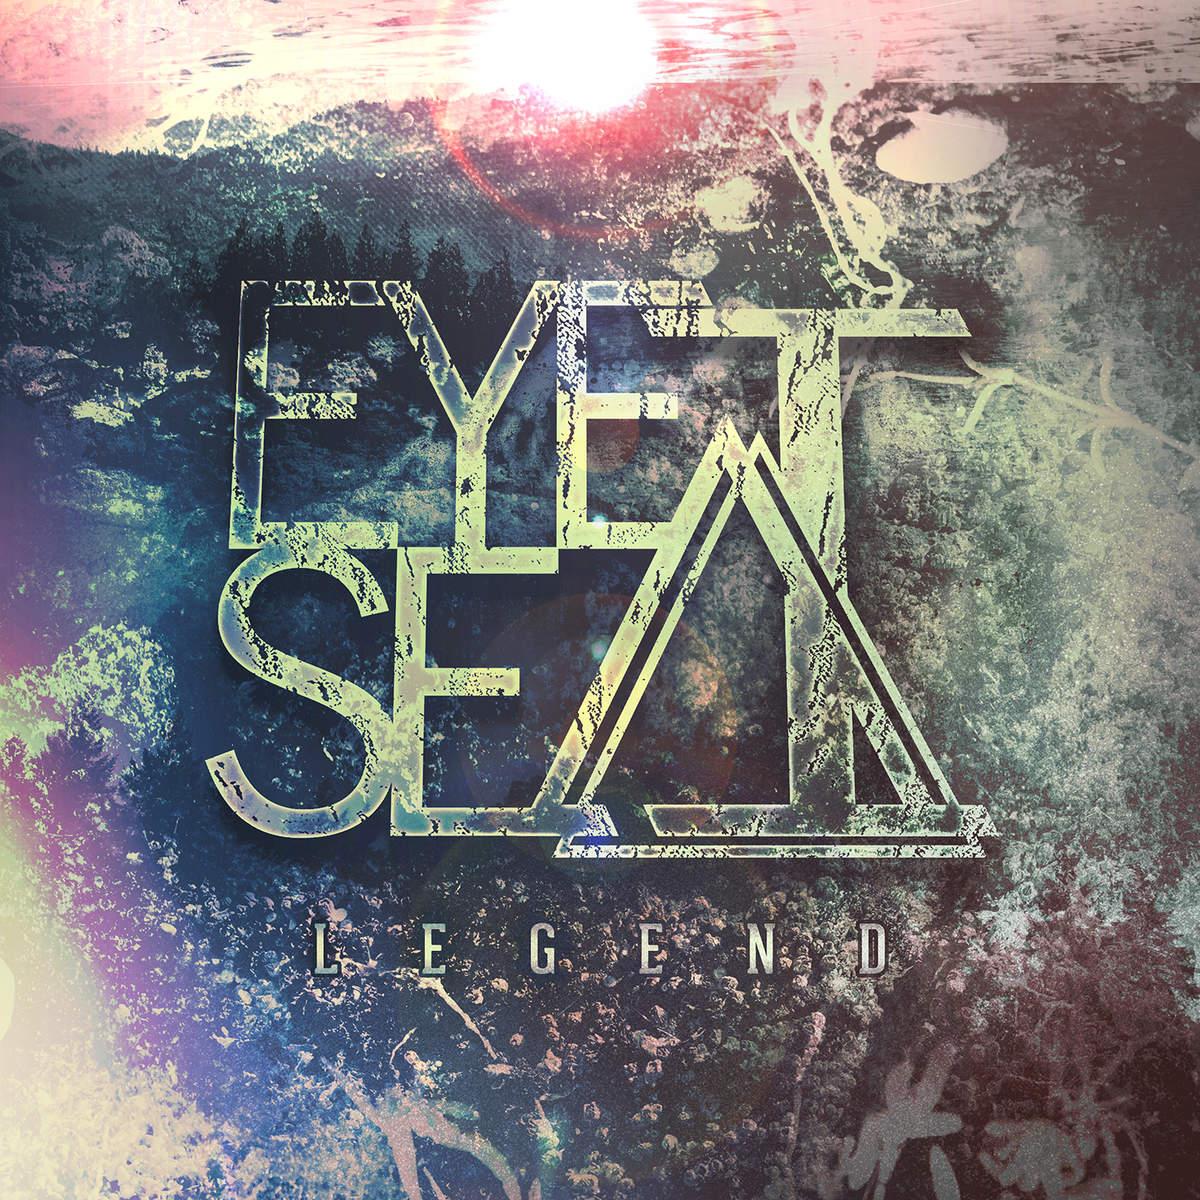 Eye Sea I - Legend (2013)